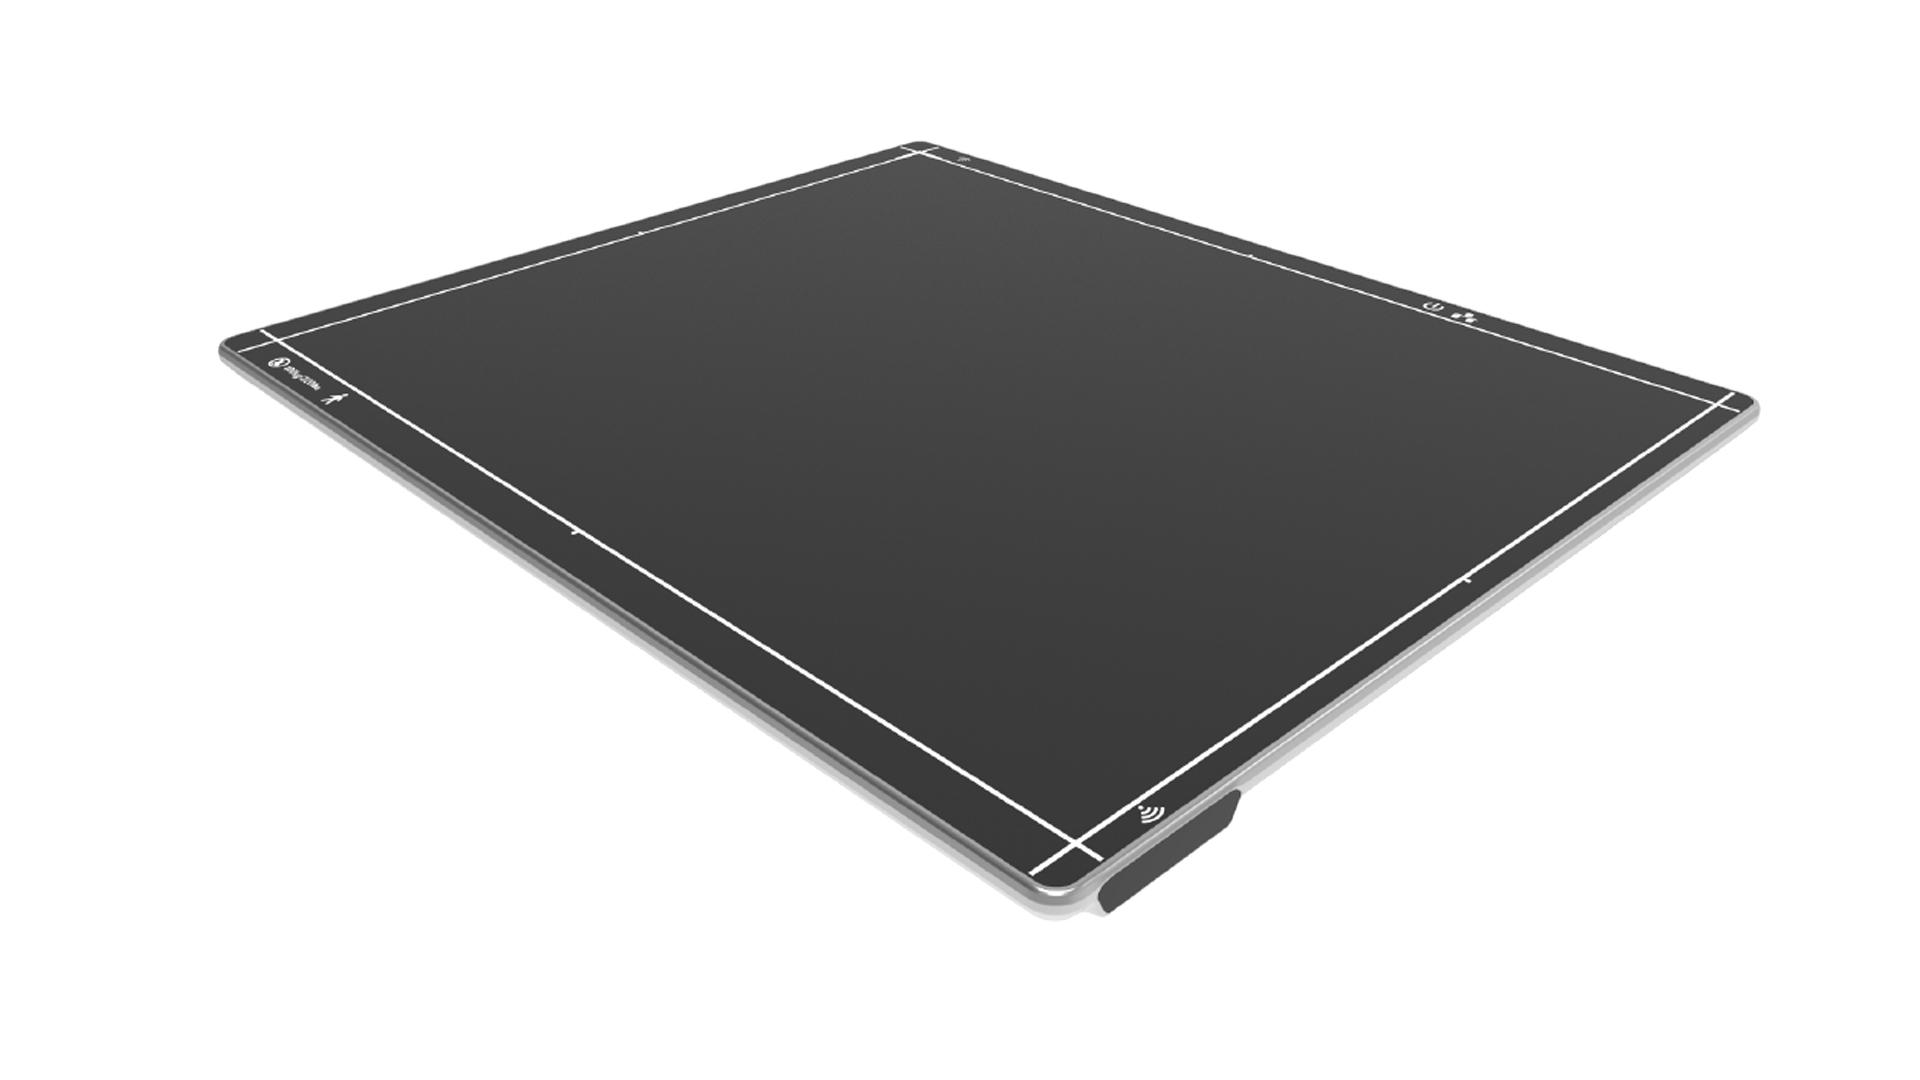 Röntgentechnik Detektoren: Varex Imaging PaxScan® 4336Wv4